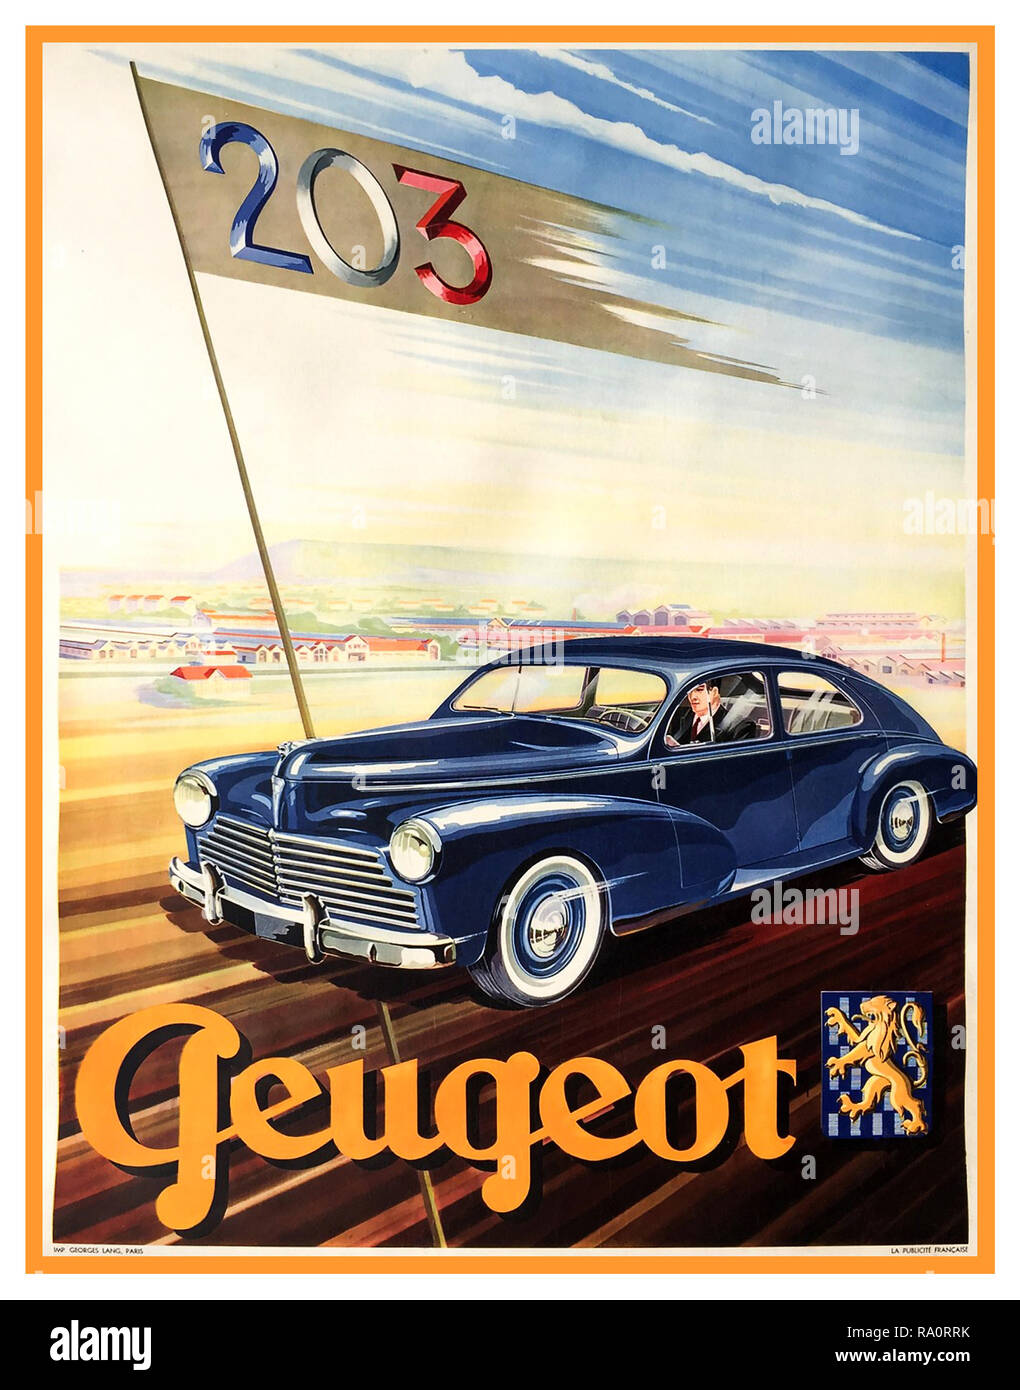 Salmson Automobile French Car Vintage European  Advertisement Art Poster Print